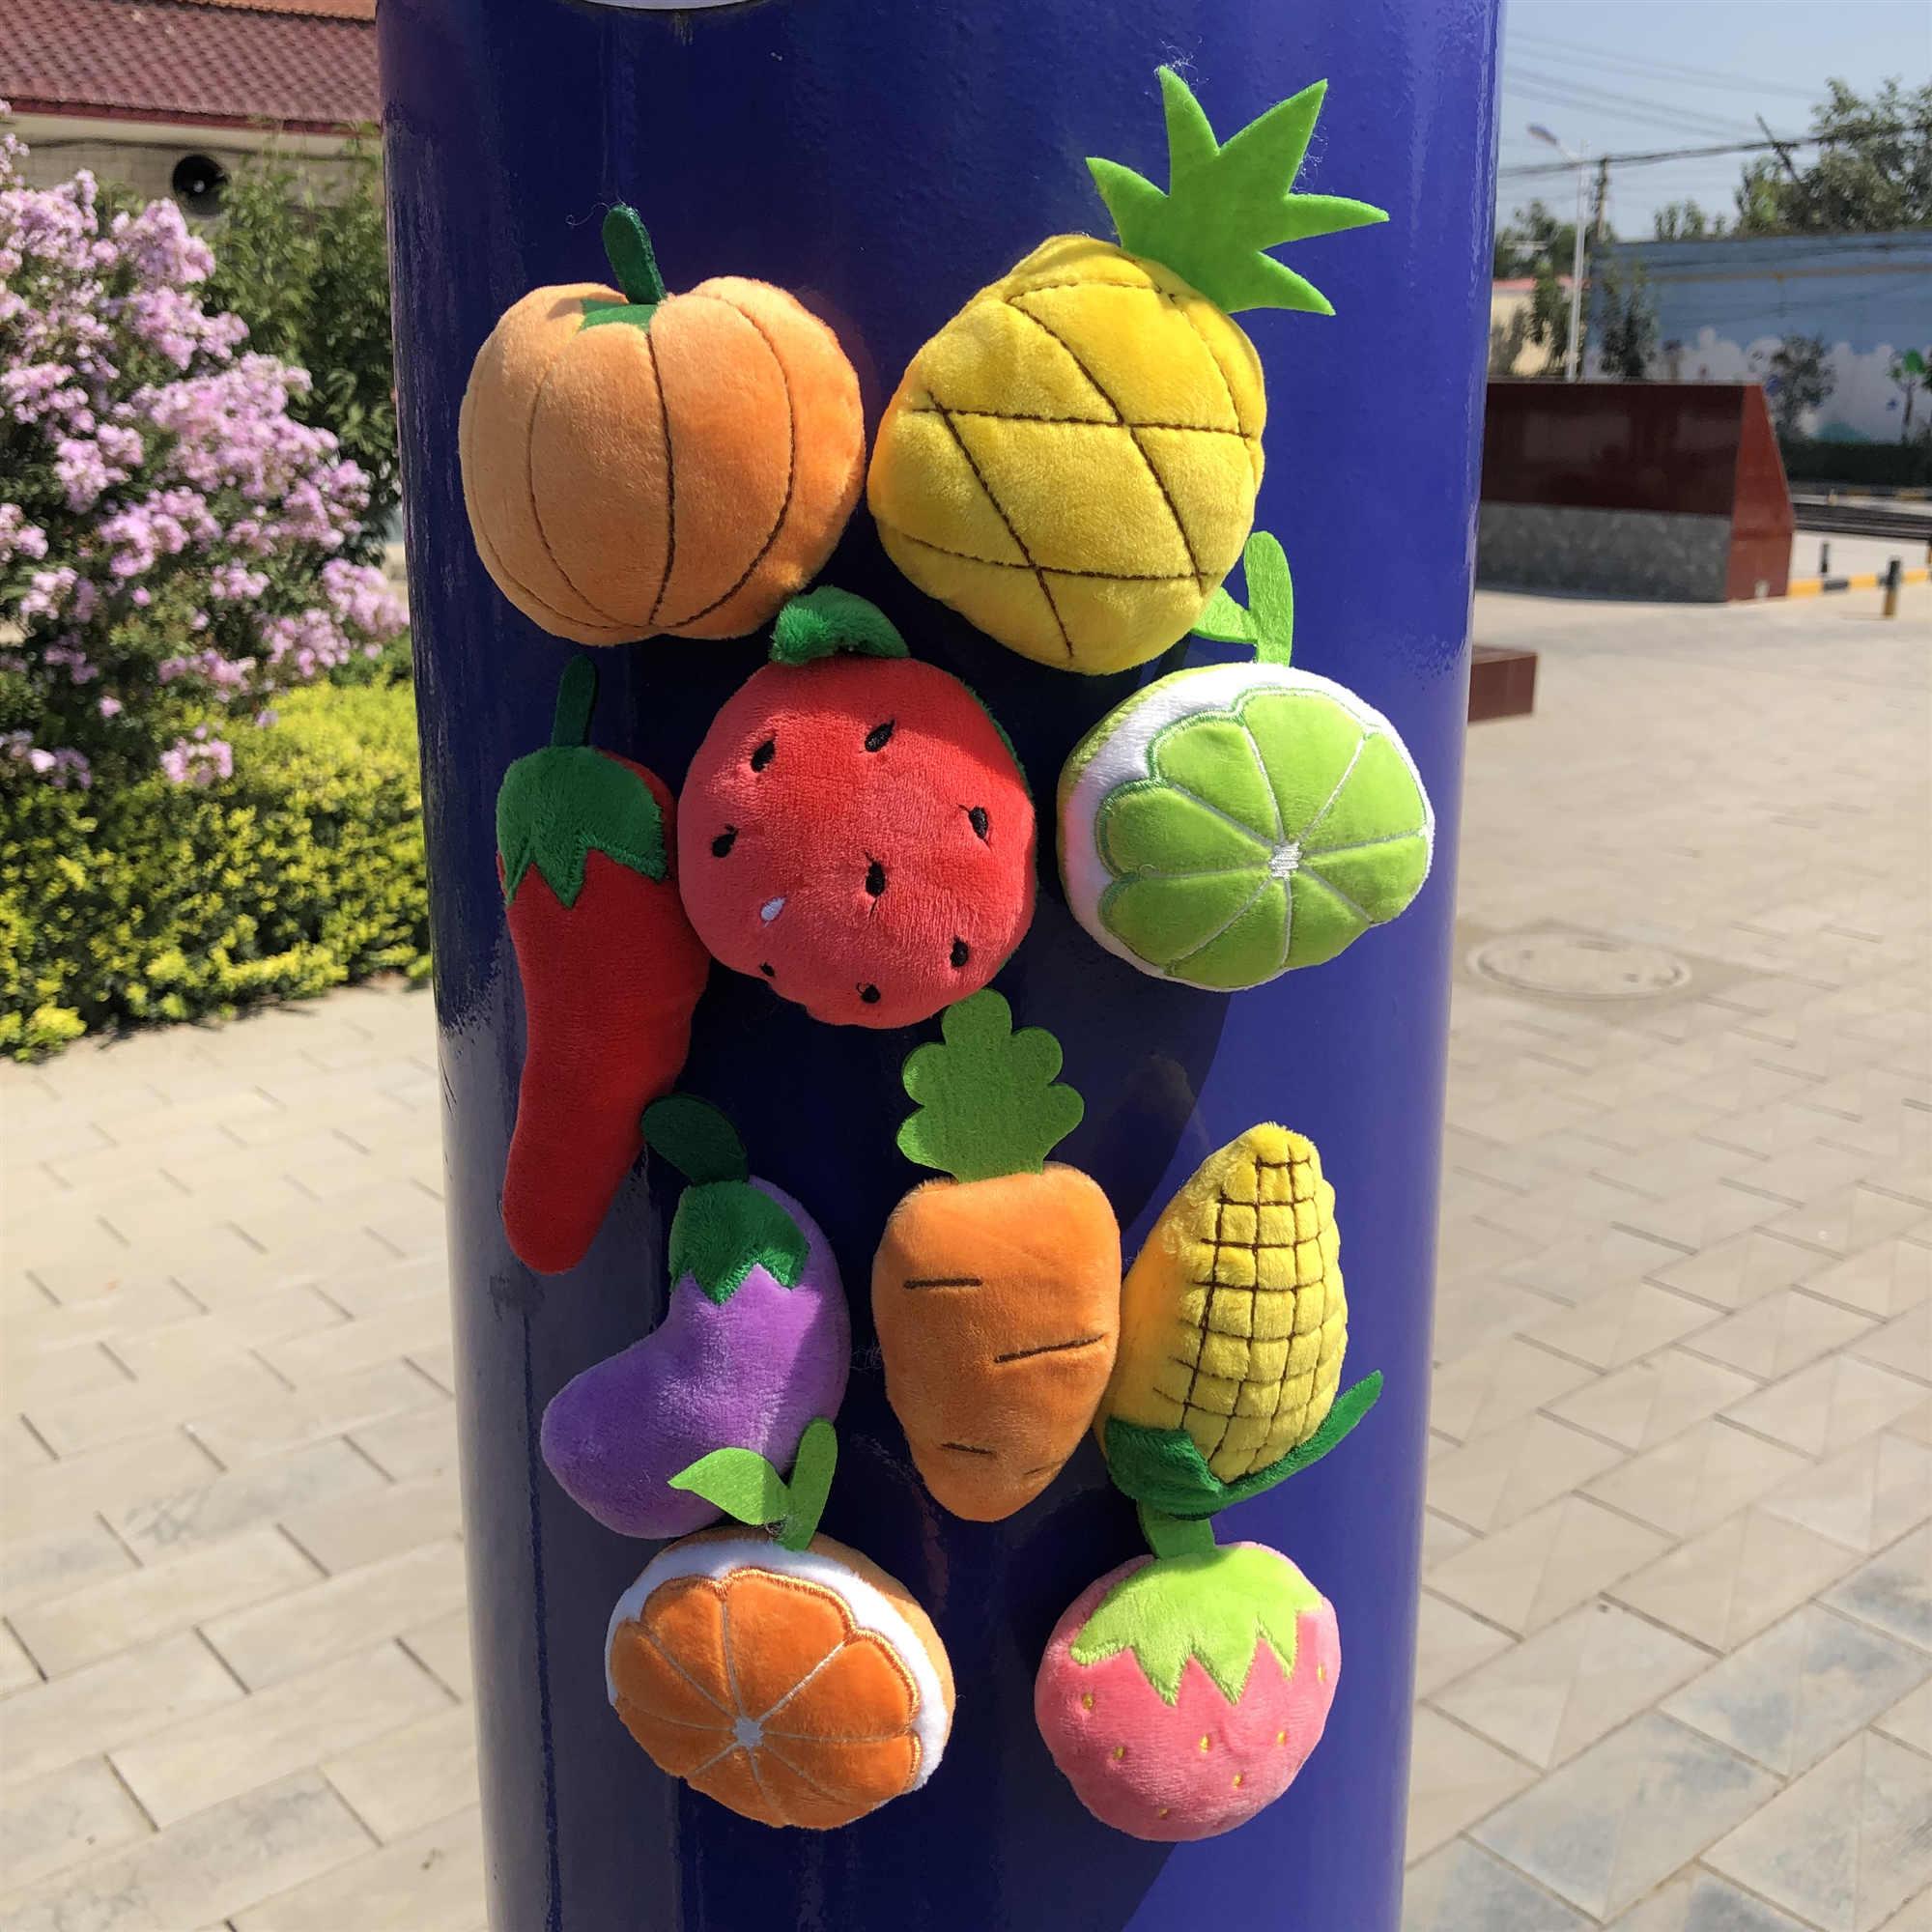 1 PCS Cartoon Soft Fridge Magnets Home Plush toys Decoration Food Sticker Fruits Paster Lovely Kids Gifts Blackboard Vegetables